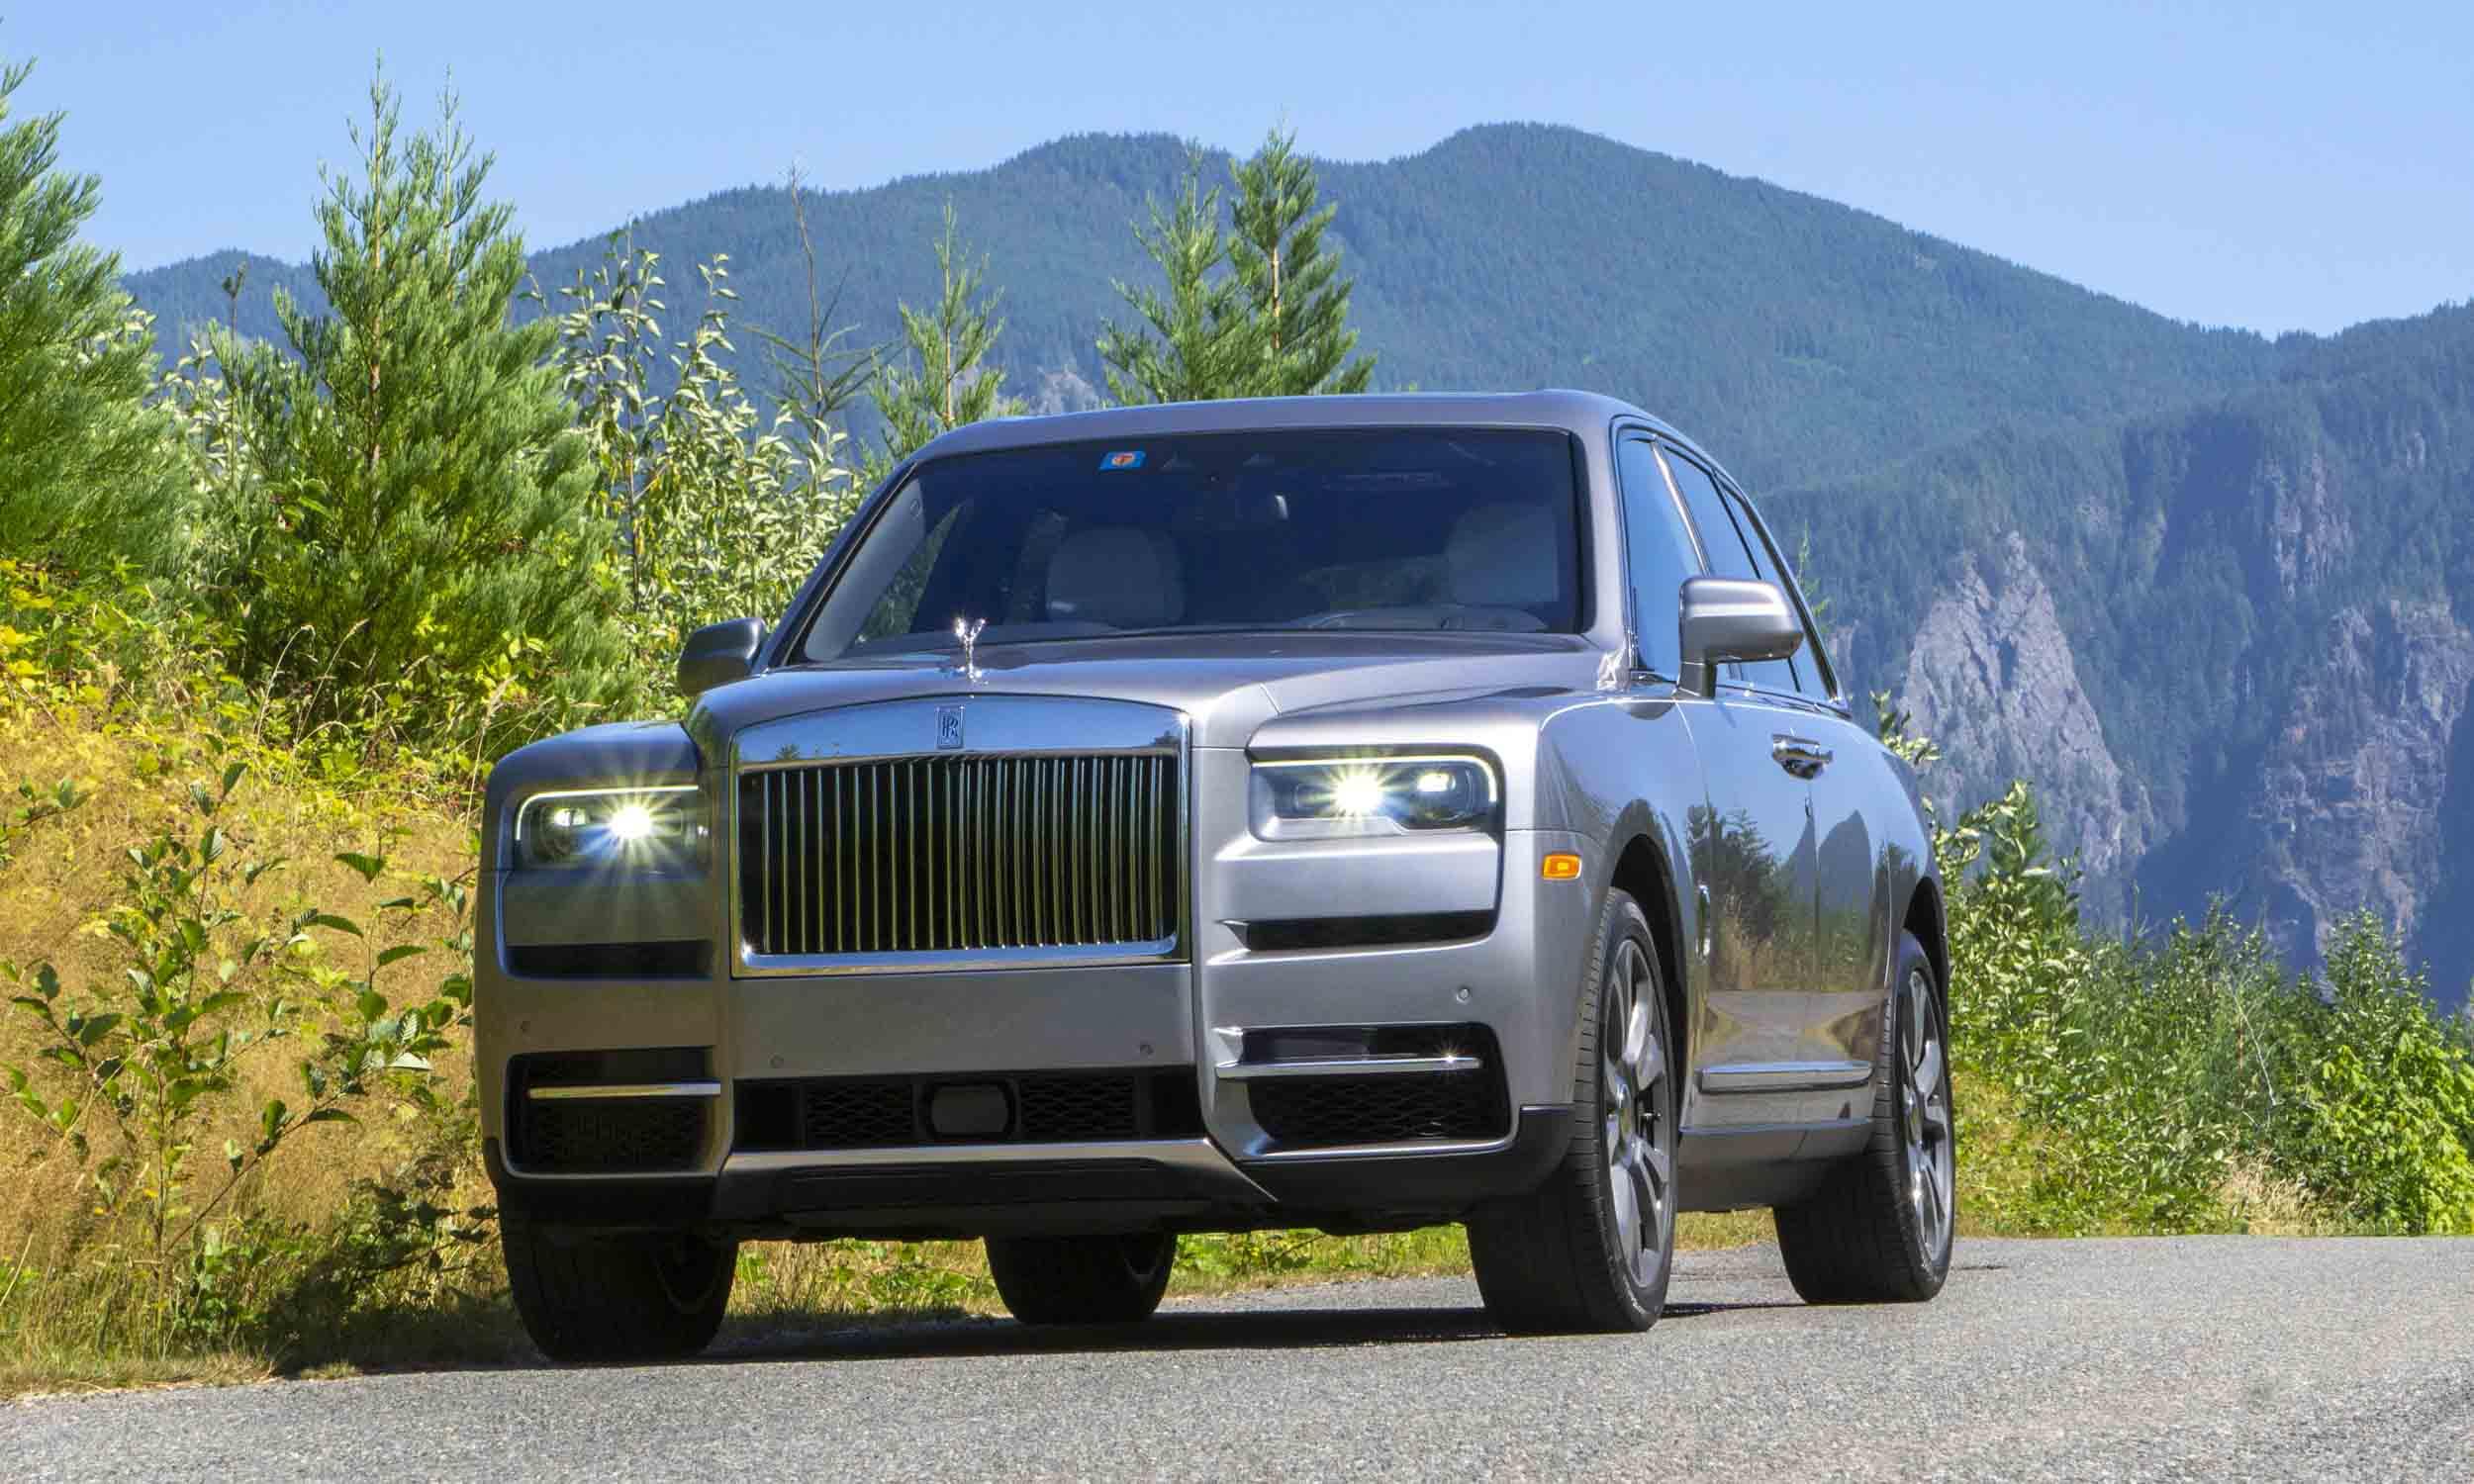 2020 RollsRoyce Cullinan Review The Pinnacle of Luxury SUVsnbsp